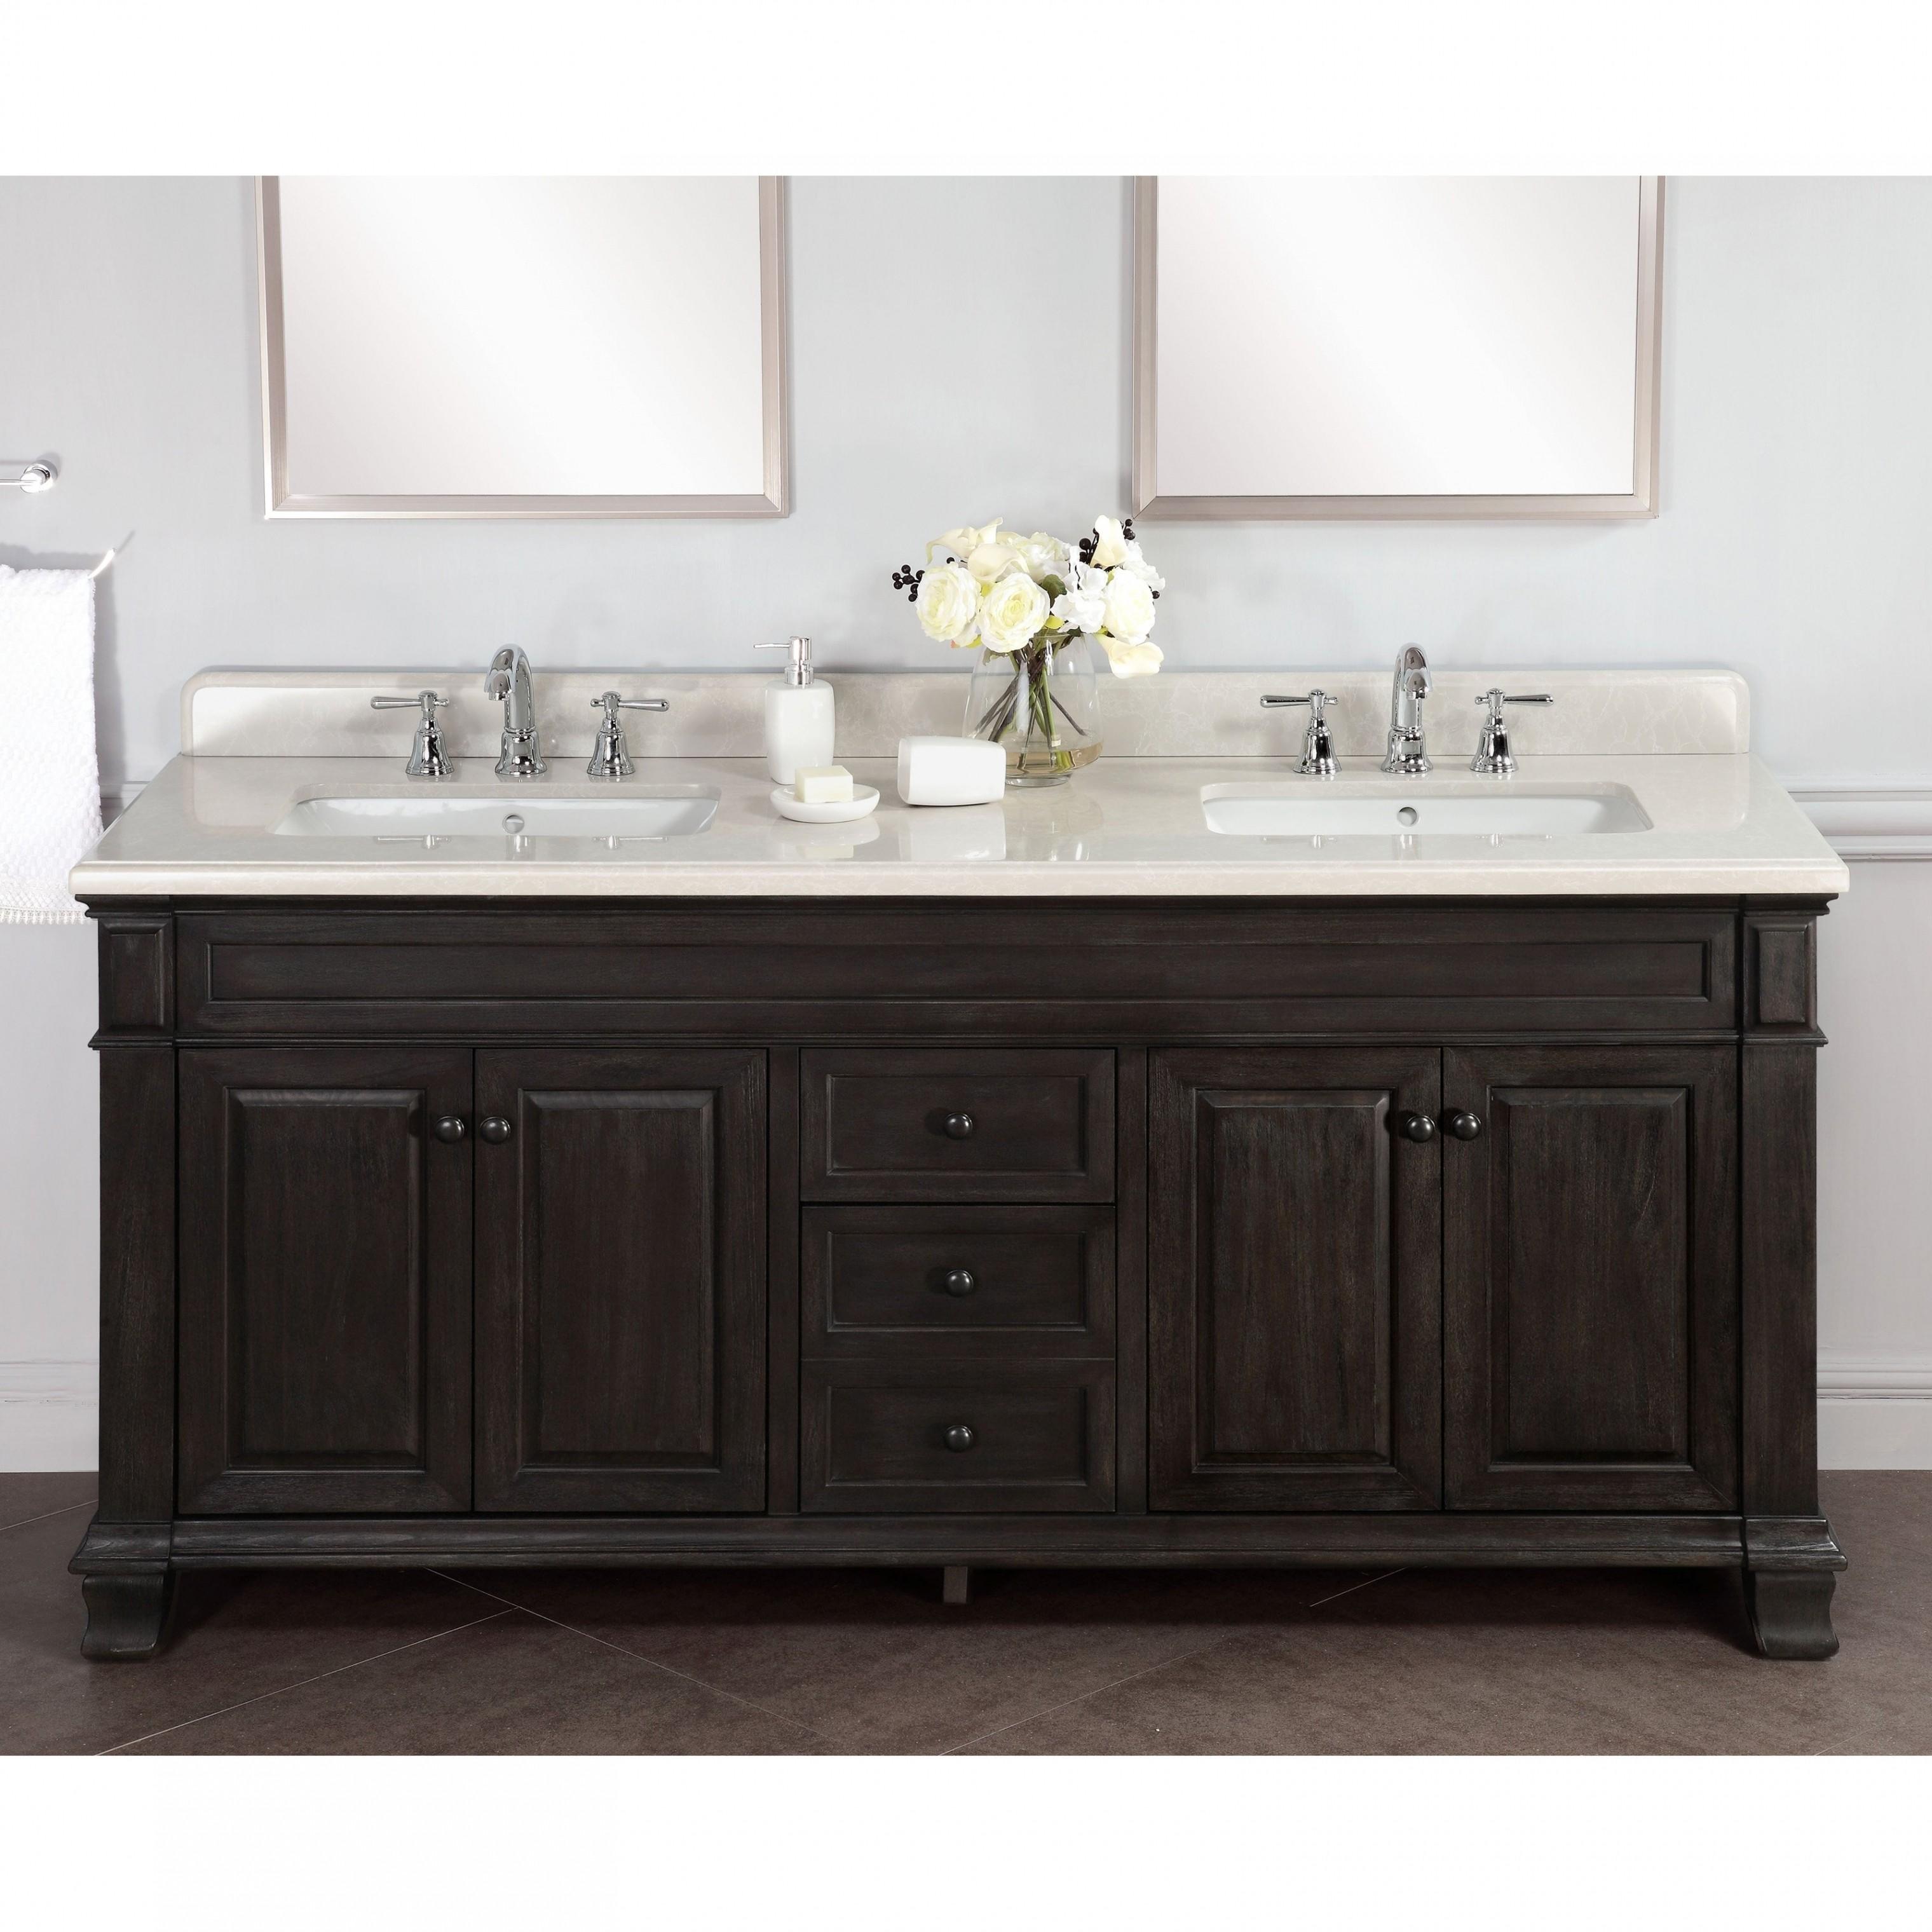 Merveilleux Home Depot Bathroom Vanities 36 Inch Lovely Lovely Home Depot Bathroom  Vanities And Sinks S Photograph